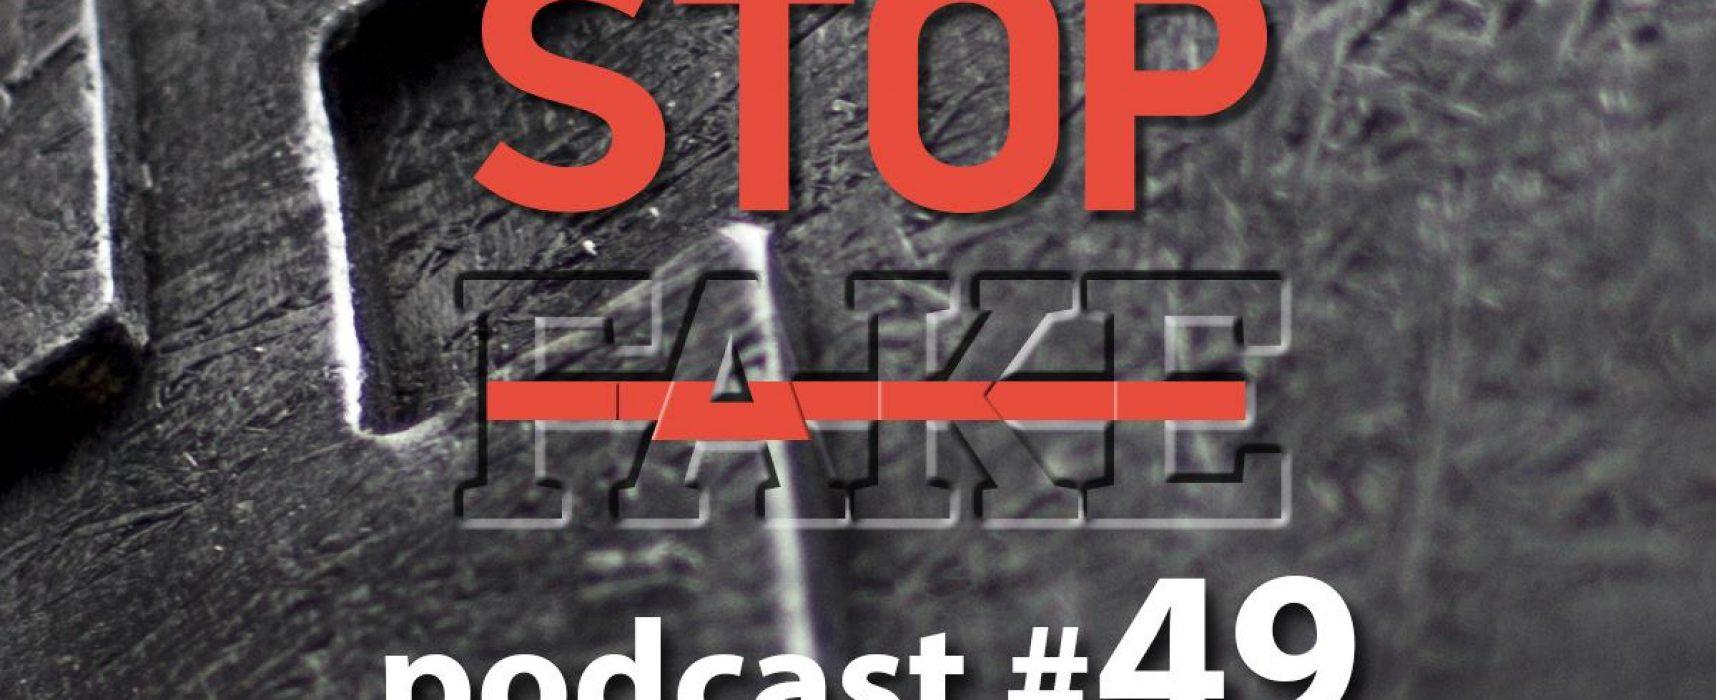 StopFake podcast #49